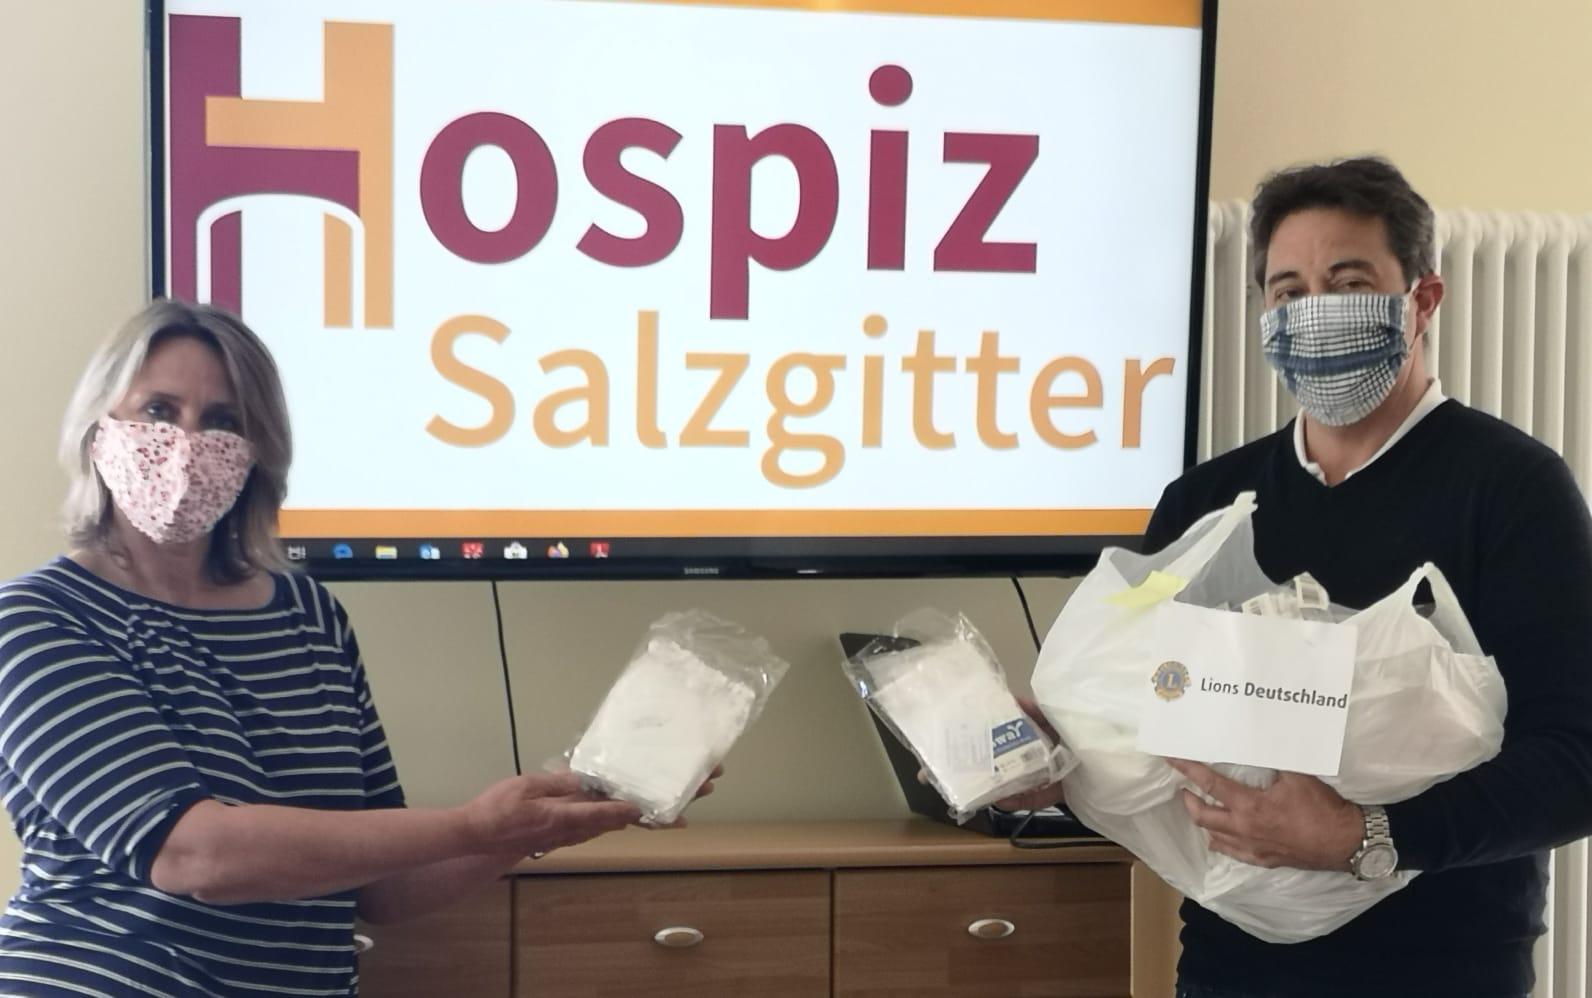 Hospiz Salzgitter - Spende Masken